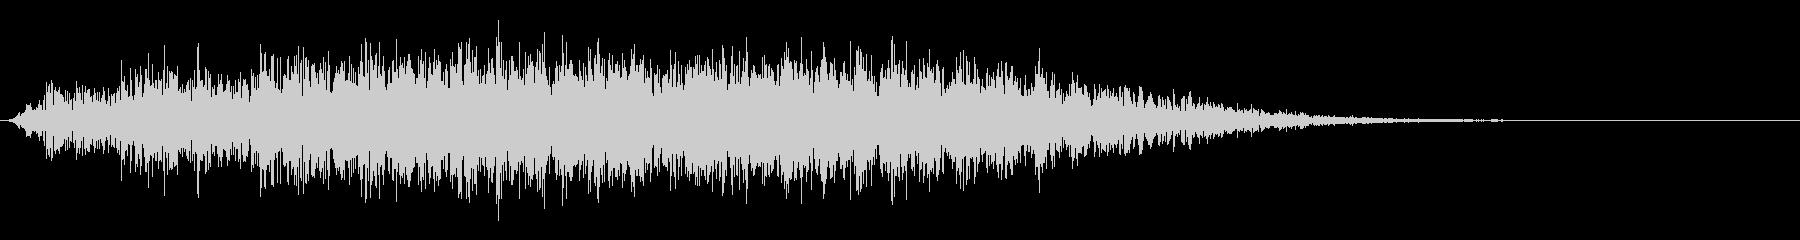 SciFi EC01_90_5の未再生の波形